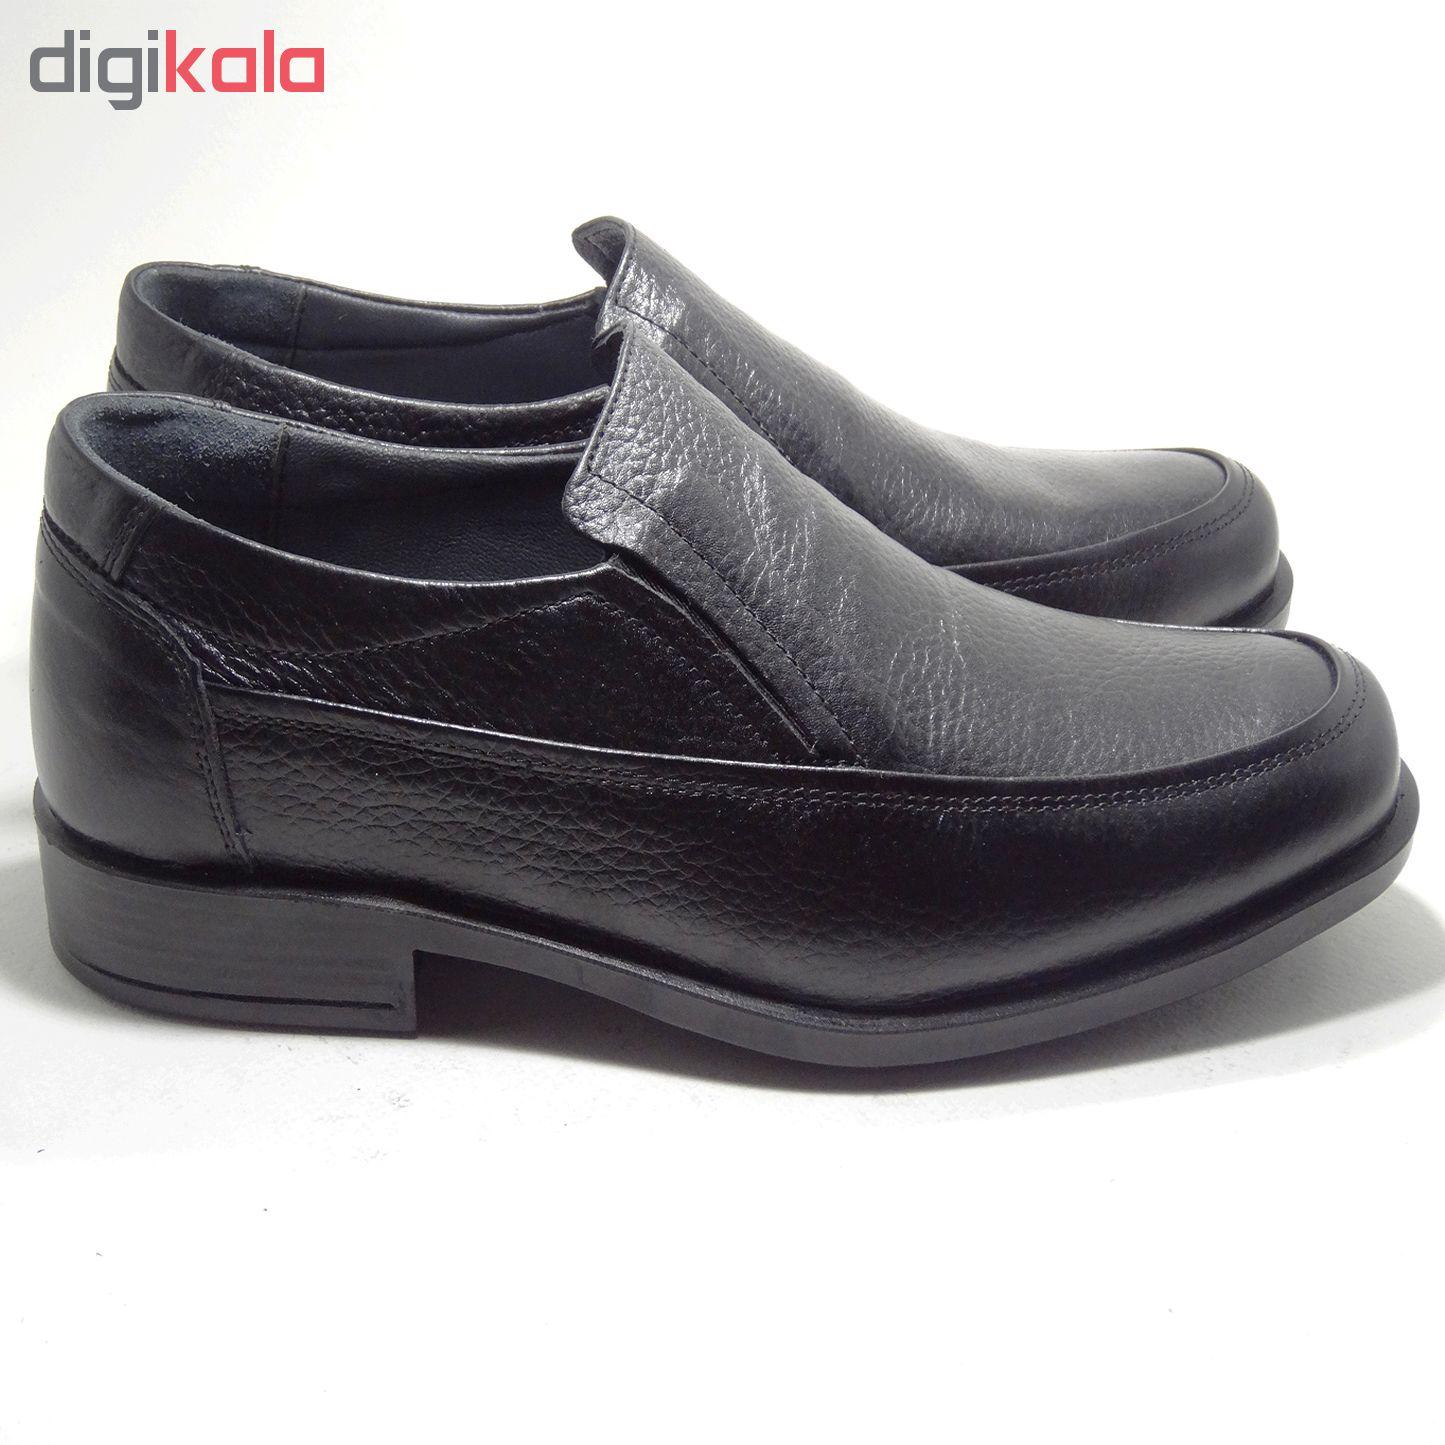 کفش مردانه مدل Veniz کد A414